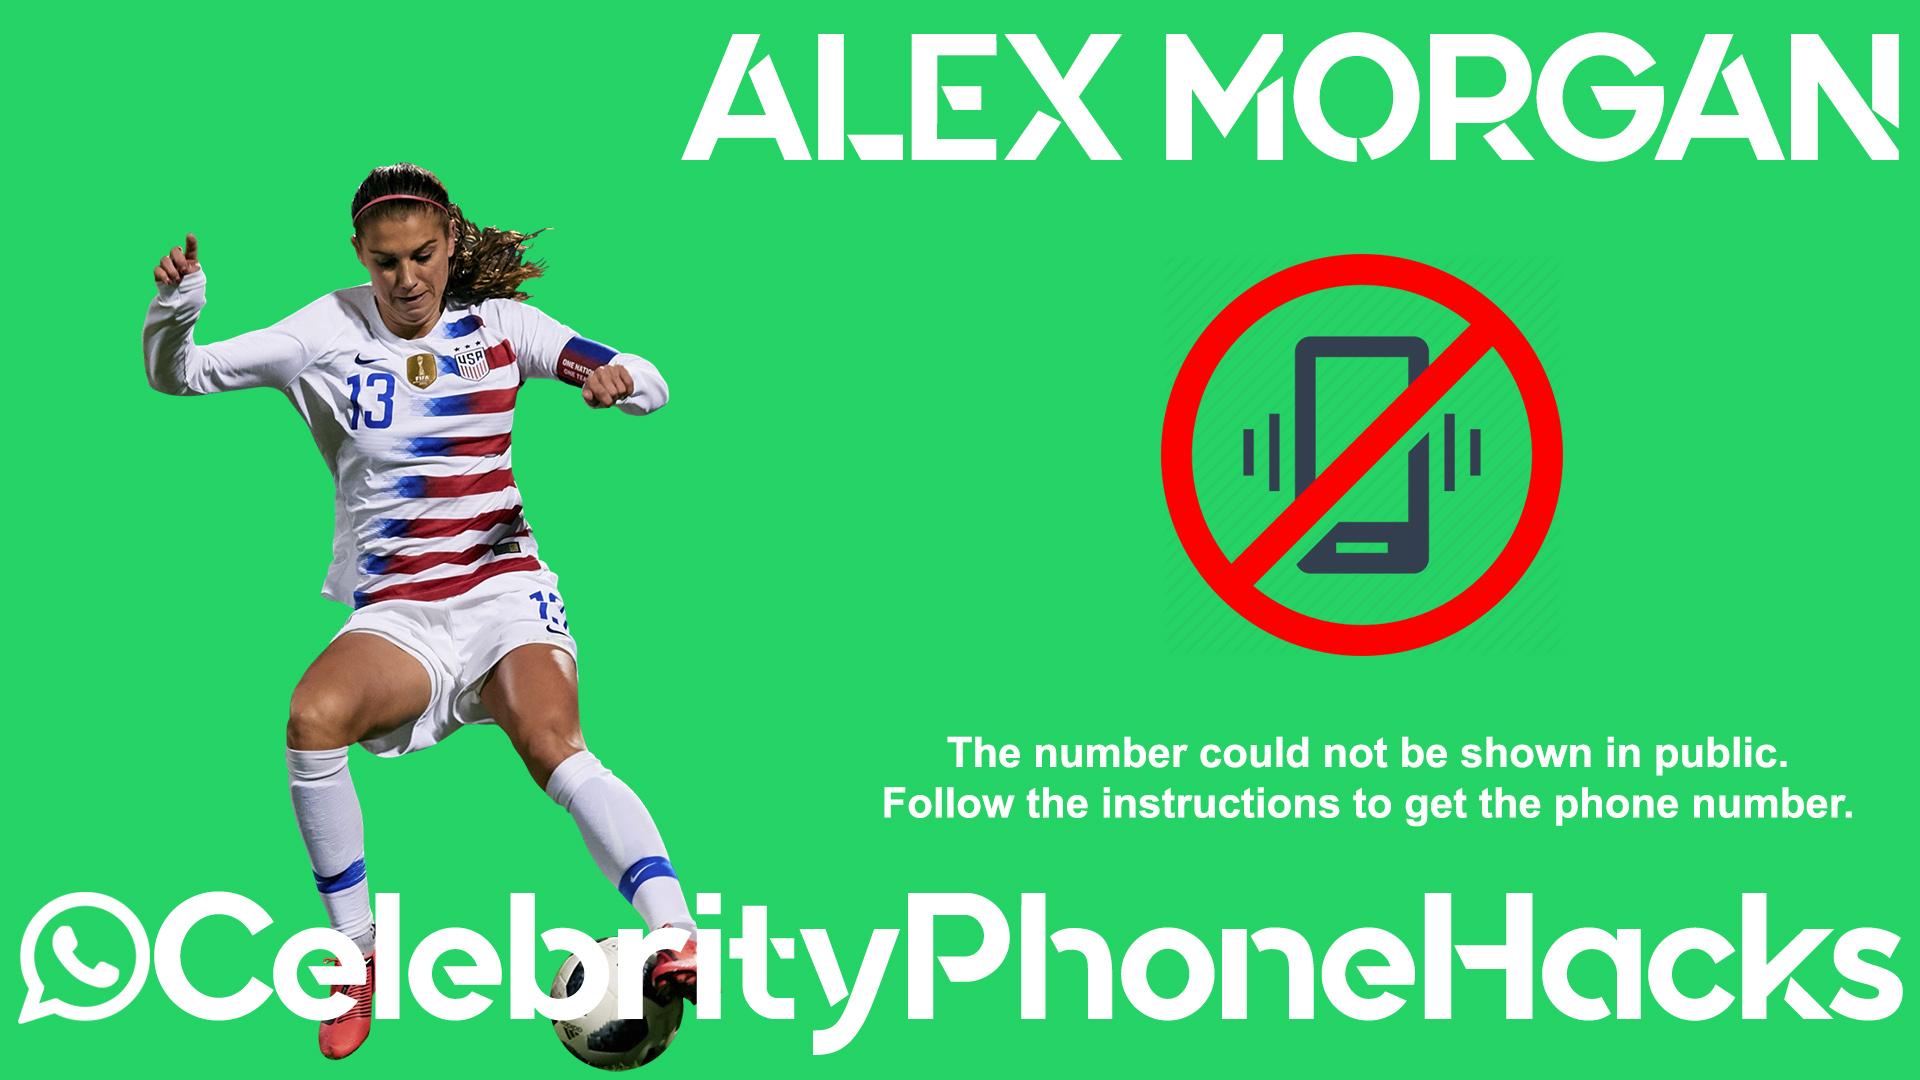 Alex Morgan real phone number 2019 whatsapp hacked leaked